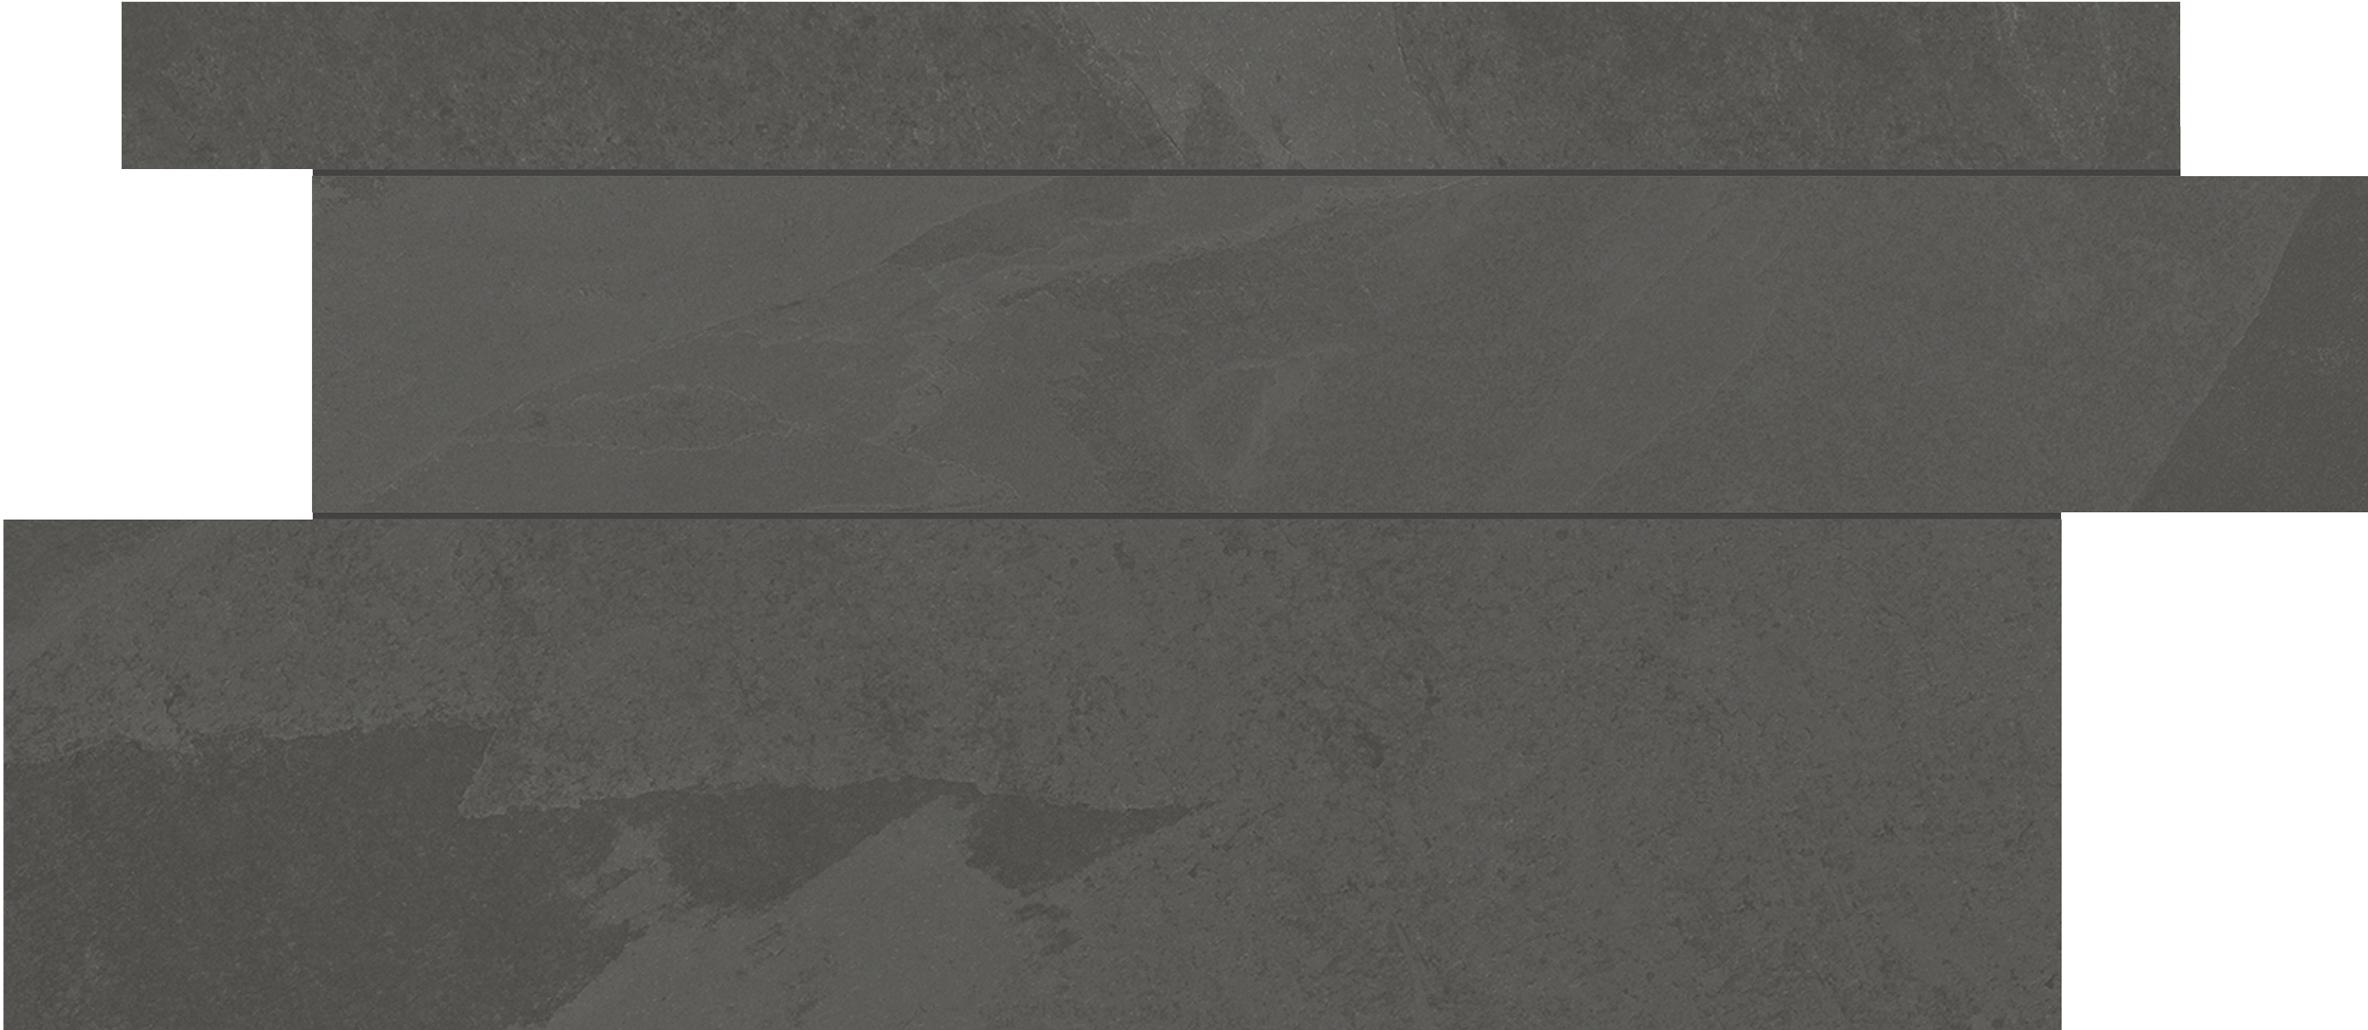 Unicom Starker BRAZILIAN SLATE PENCIL WHITE PLANK UNI-0008489 Bodenfliese 30x60 Matt